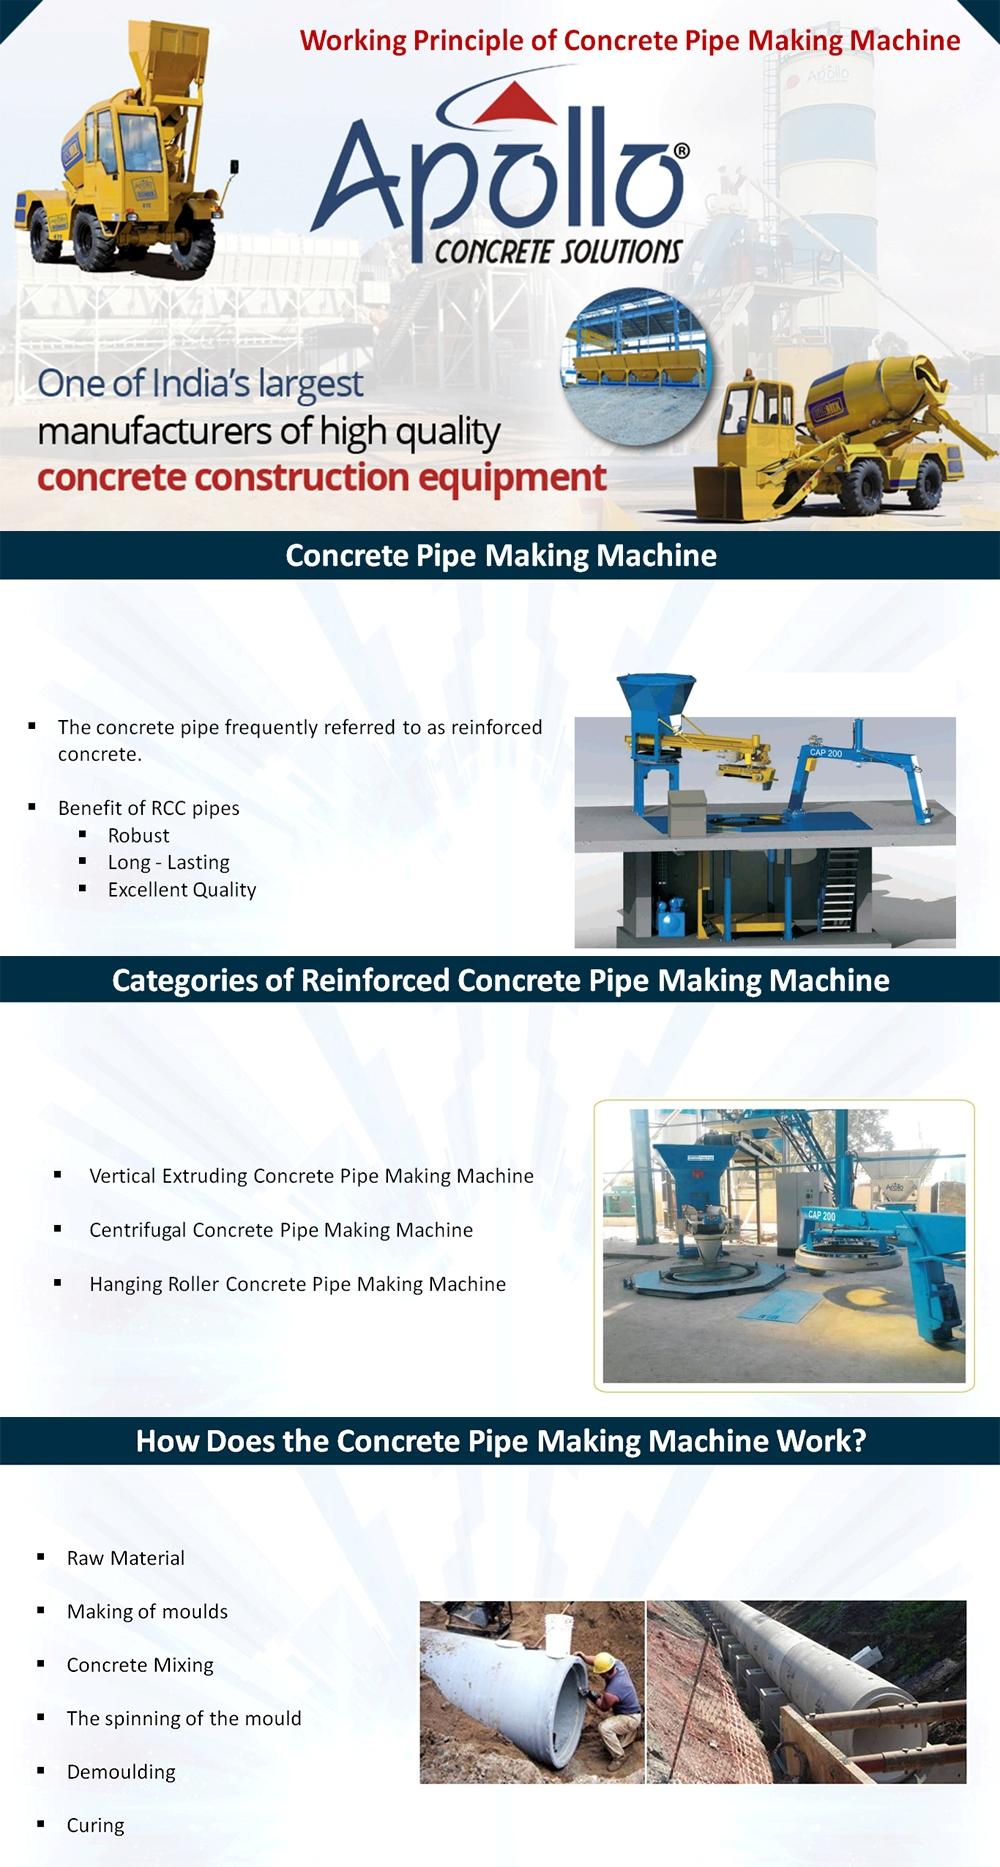 Working Principle of Concrete Pipe Making Machine